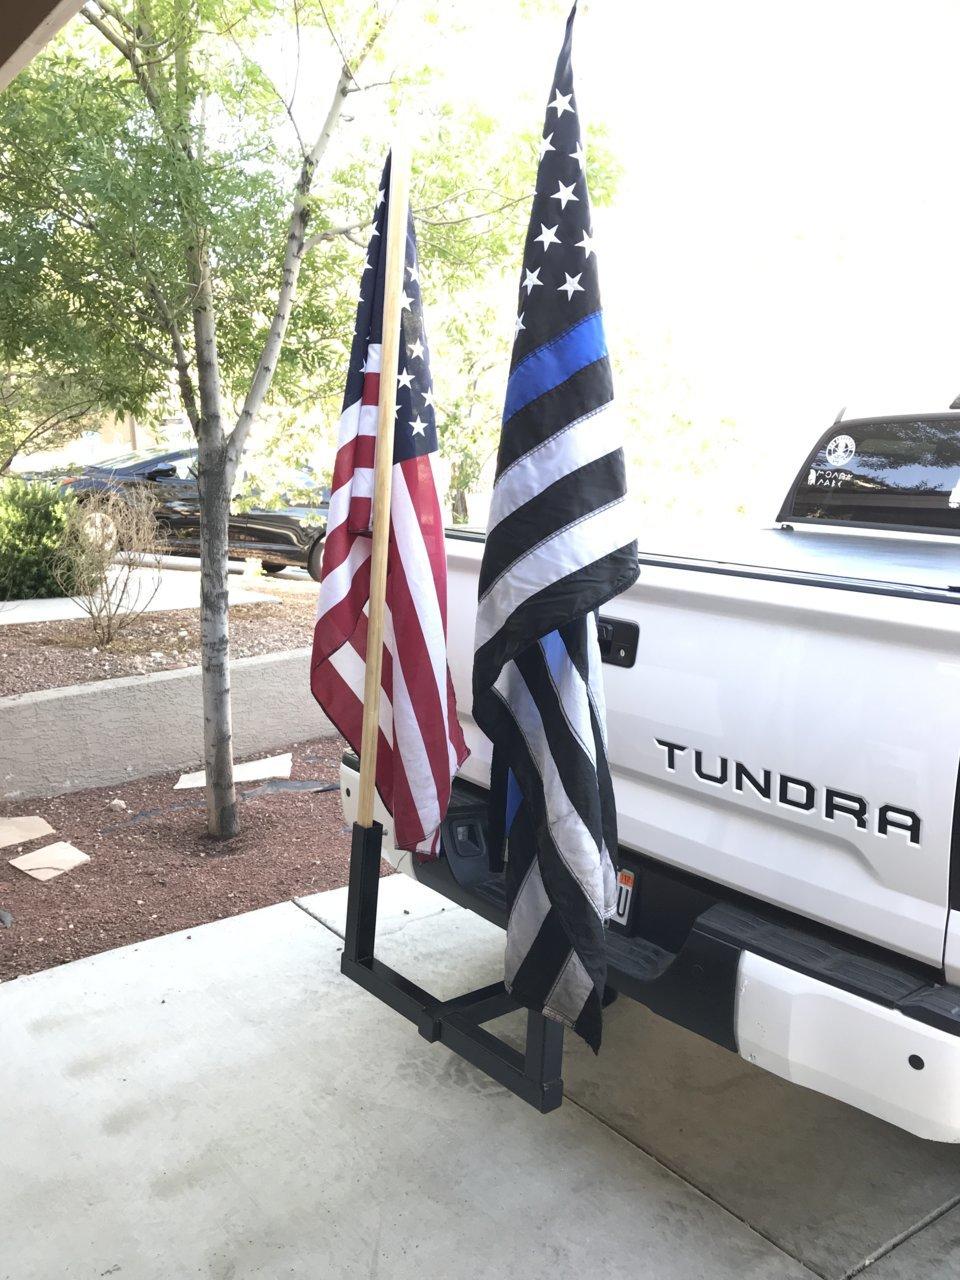 Hitch Mounted Flag Pole Holder 30 00 Toyota Tundra Forum